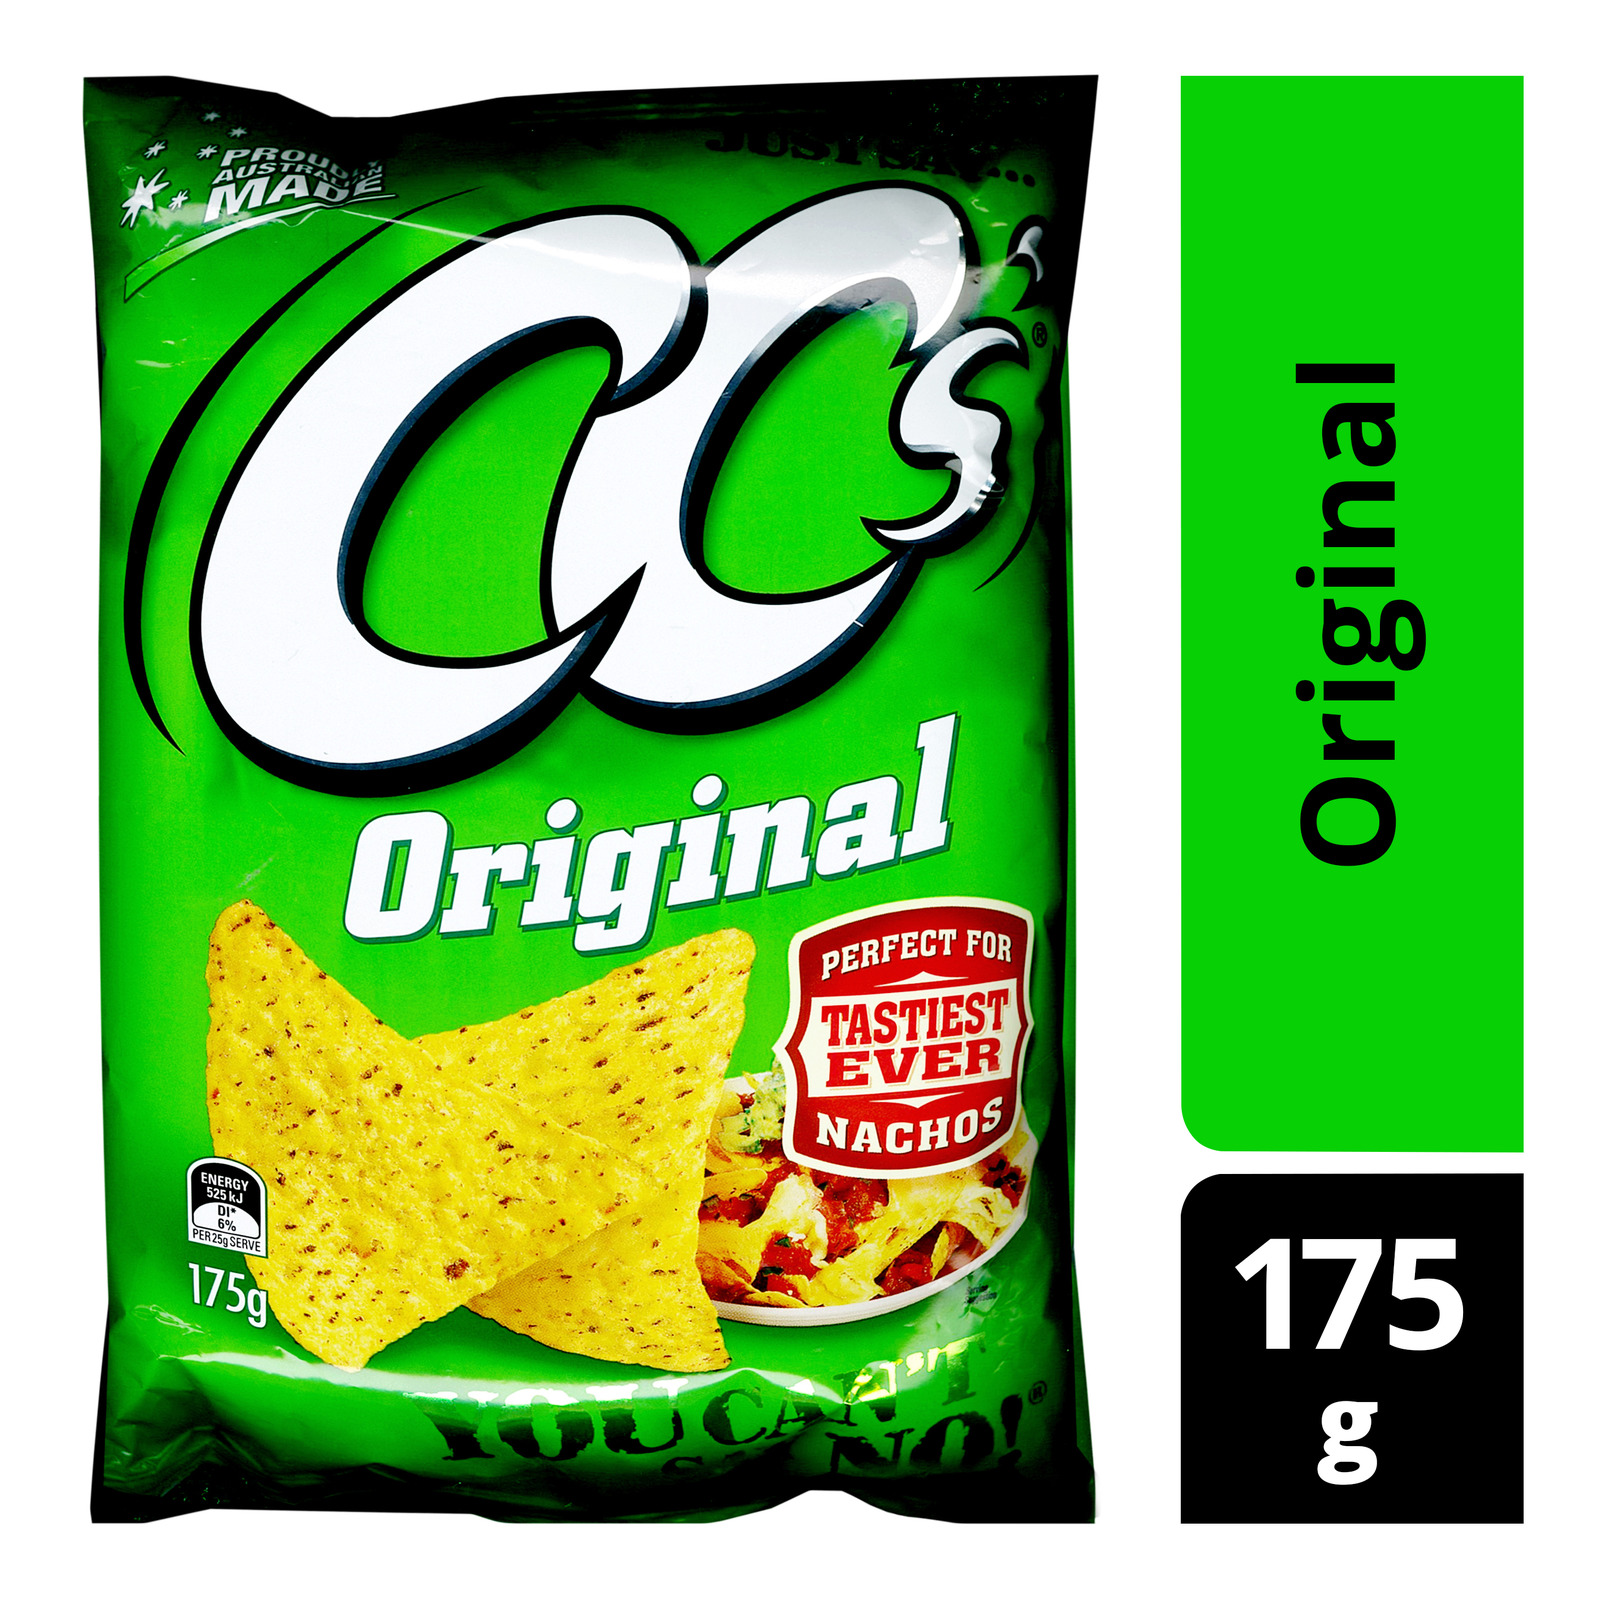 CC's Corn Chips - Original